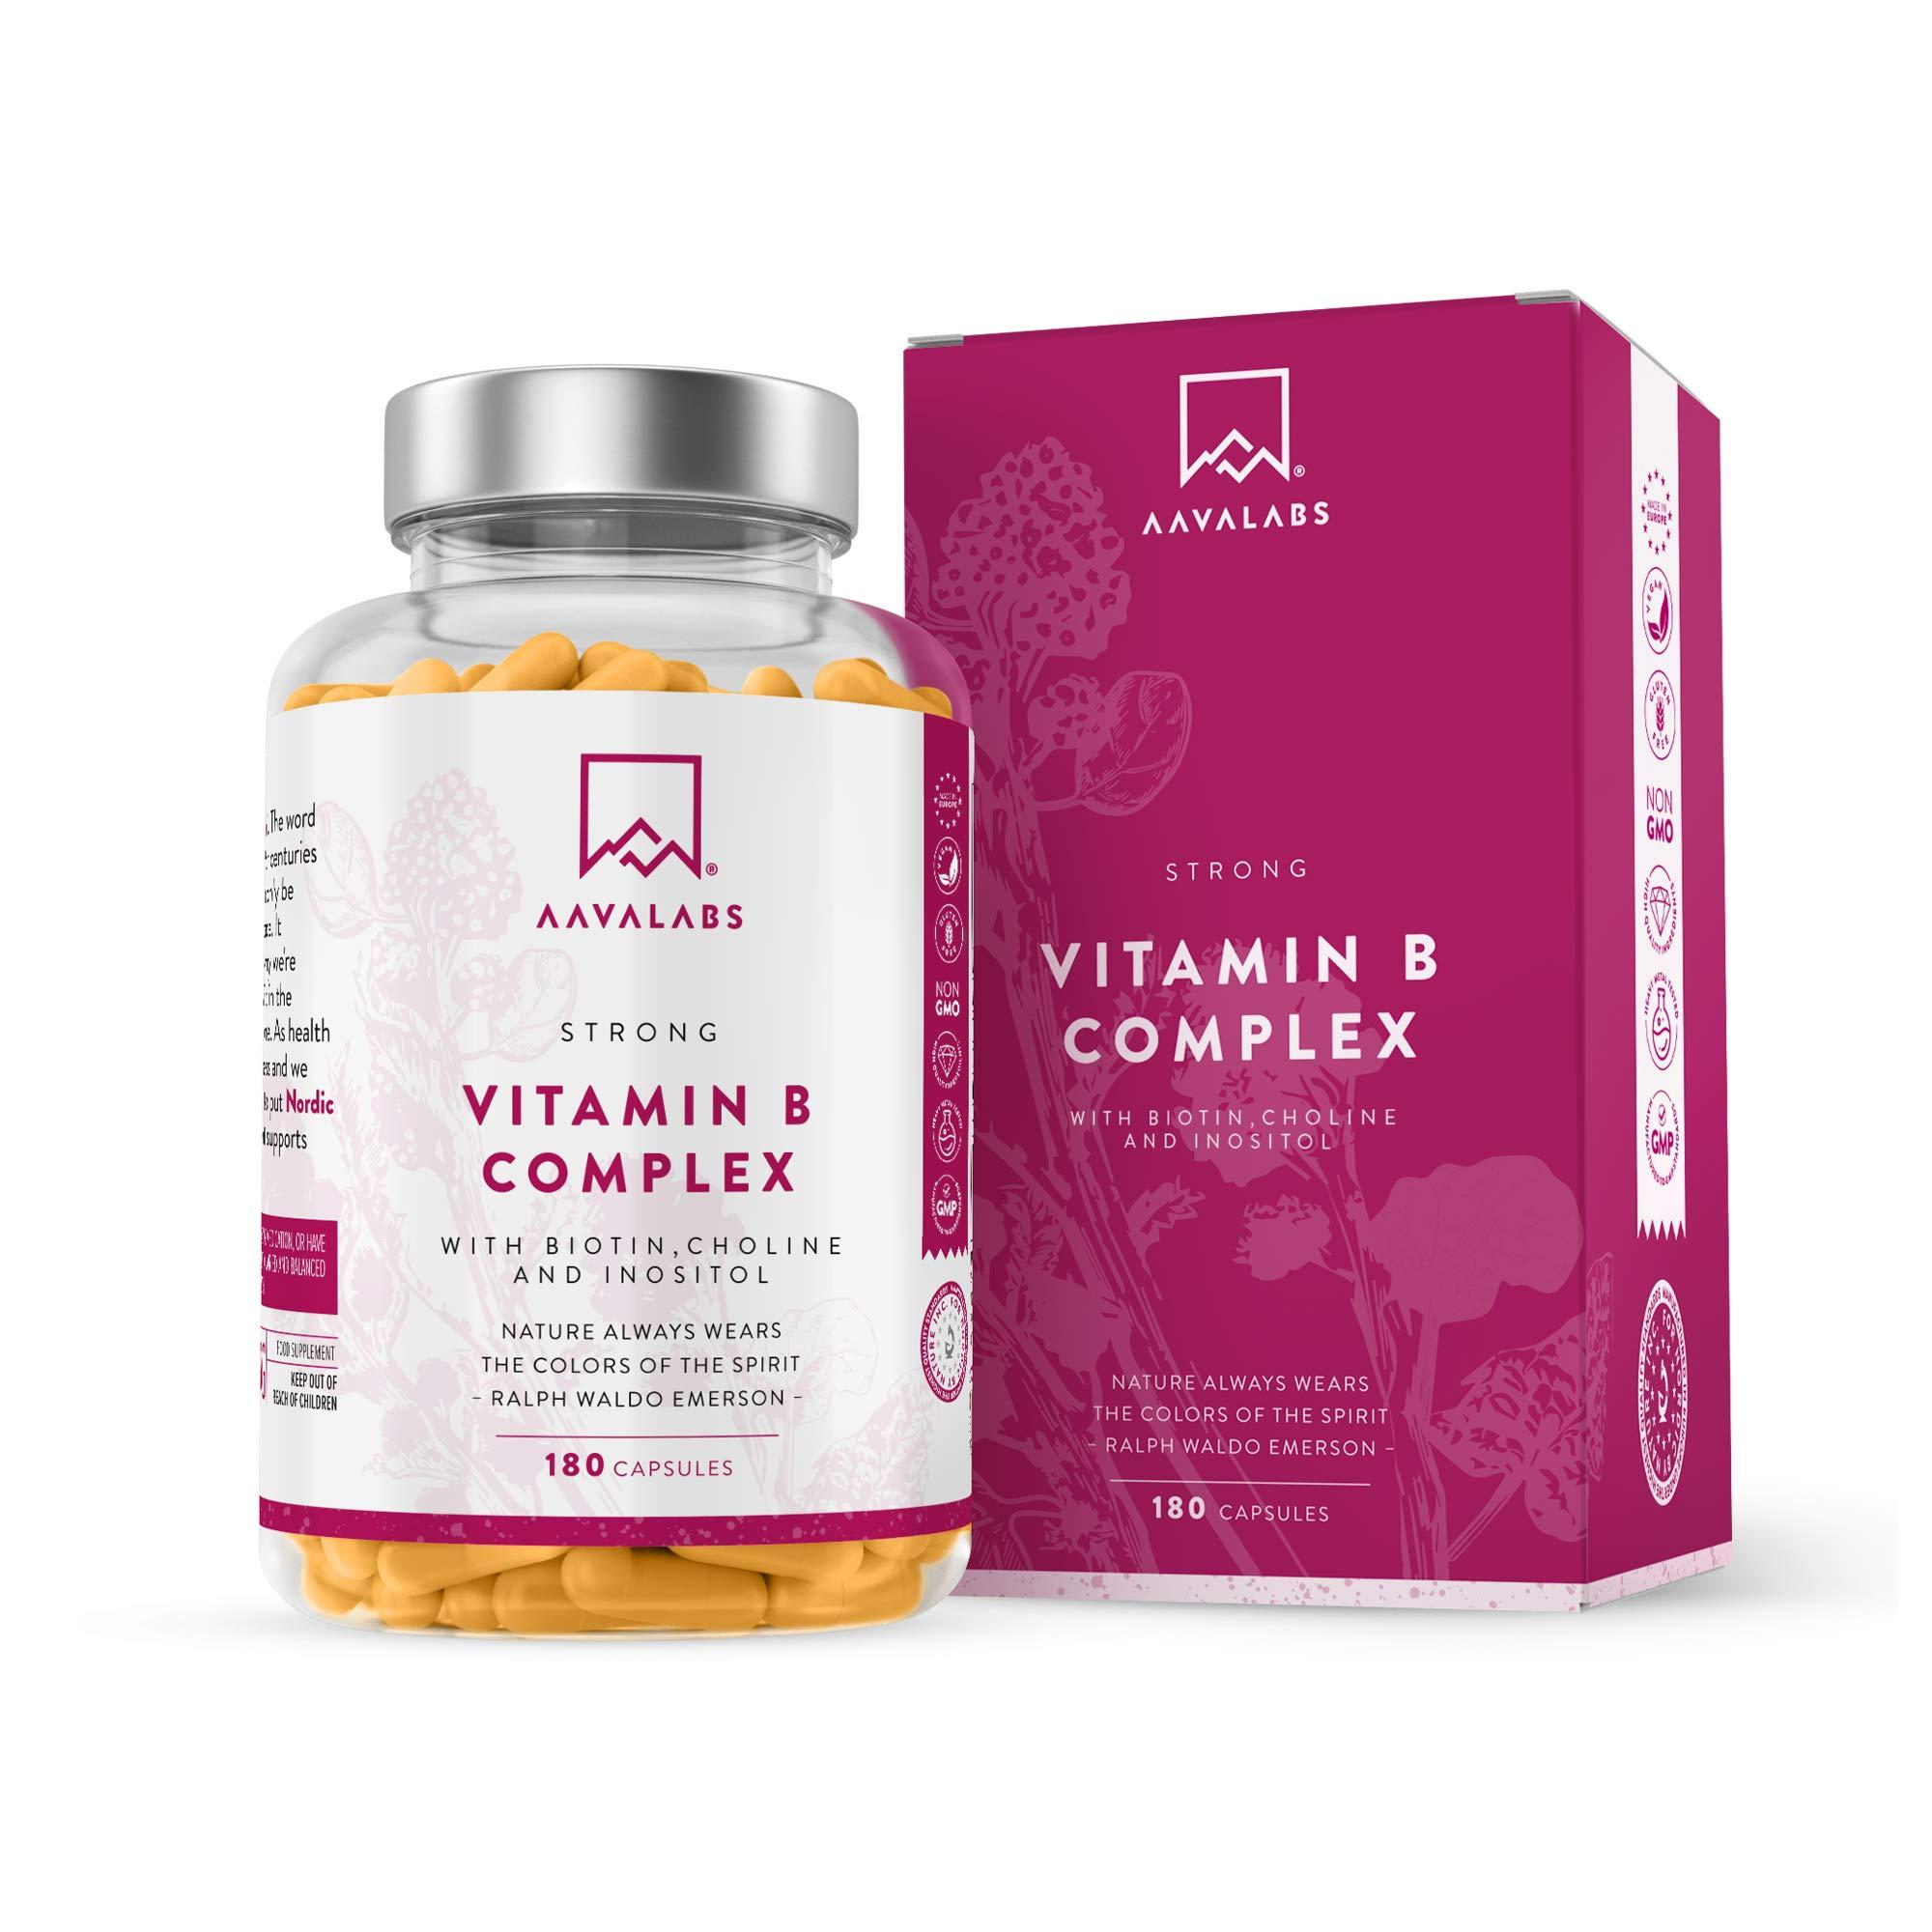 Vitamin B Complex High Strength Capsules - Includes Essential Multi B-Vitamins B12 Tablets, B6, Vitamin B3, B5, Biotin, Folate, Niacin, Inositol - 1 Capsule Daily (180 Capsule Supply) - 100% Vegan